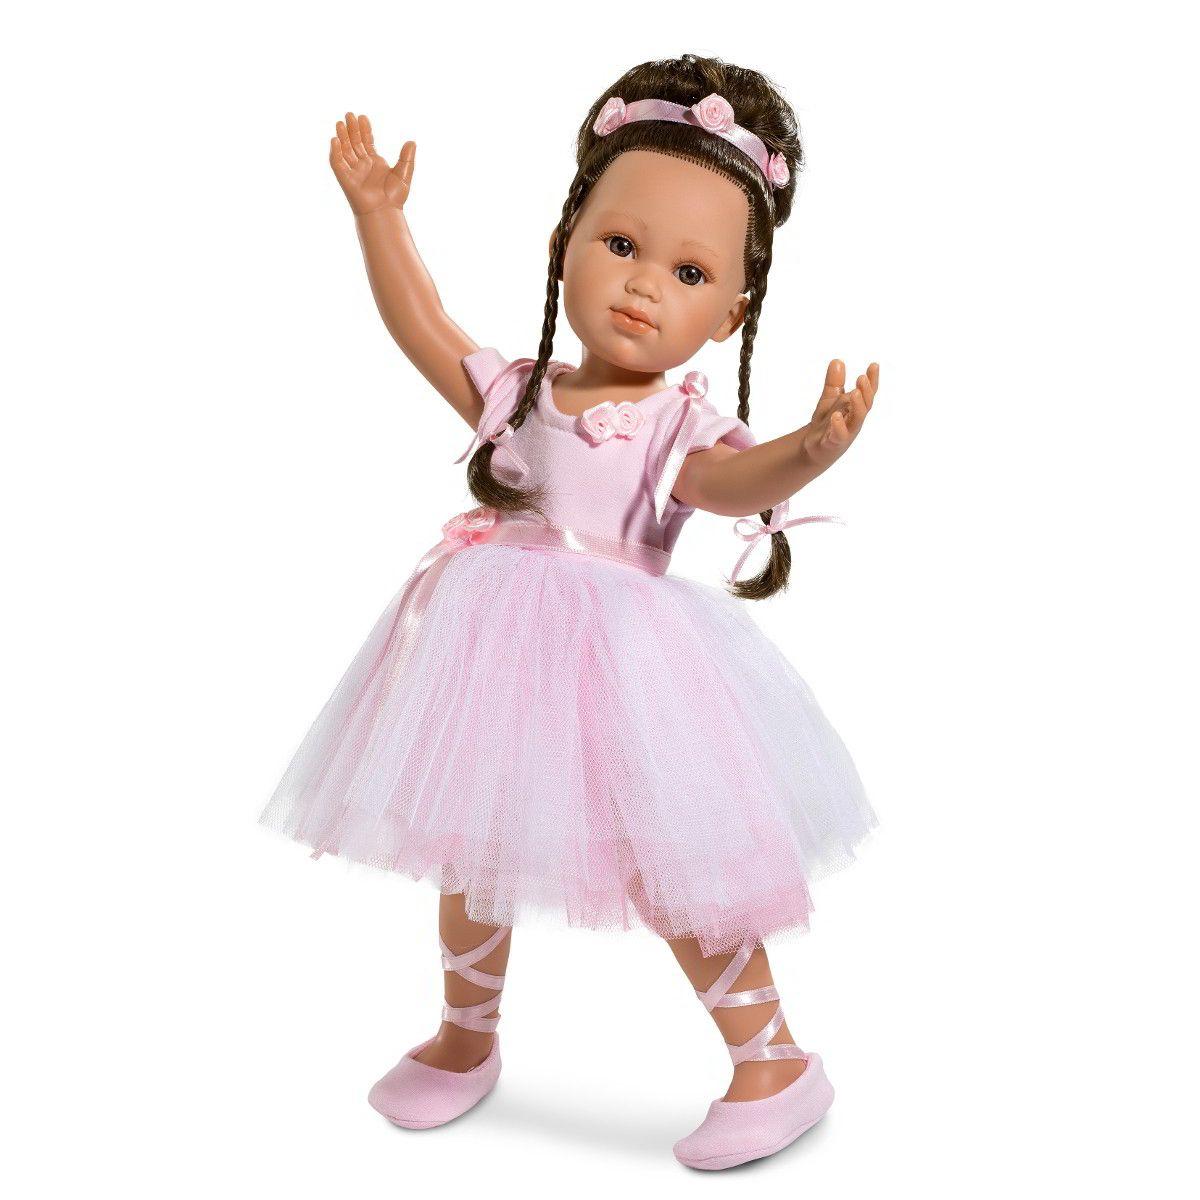 Кукла балерина Ольга, 42 смИспанские куклы Llorens Juan, S.L.<br>Кукла балерина Ольга, 42 см<br>